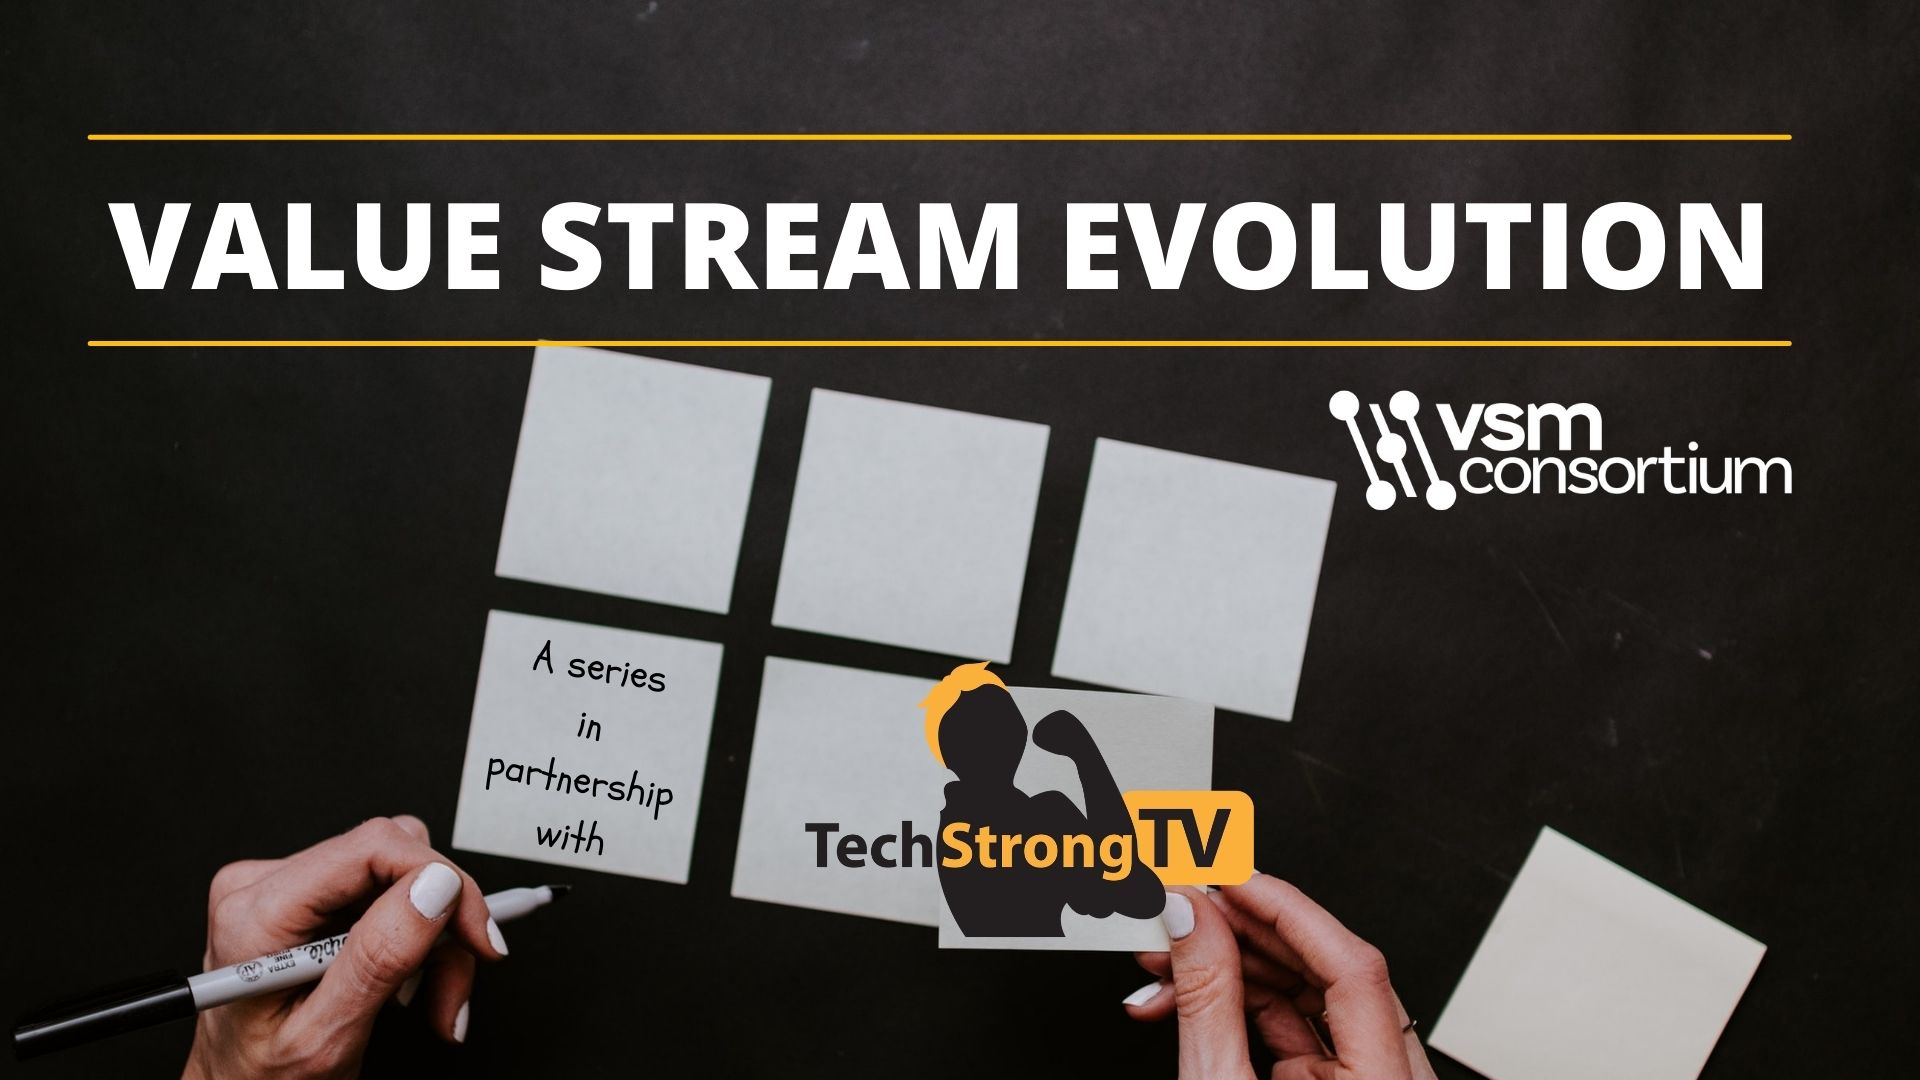 VALUE STREAM EVOLUTION